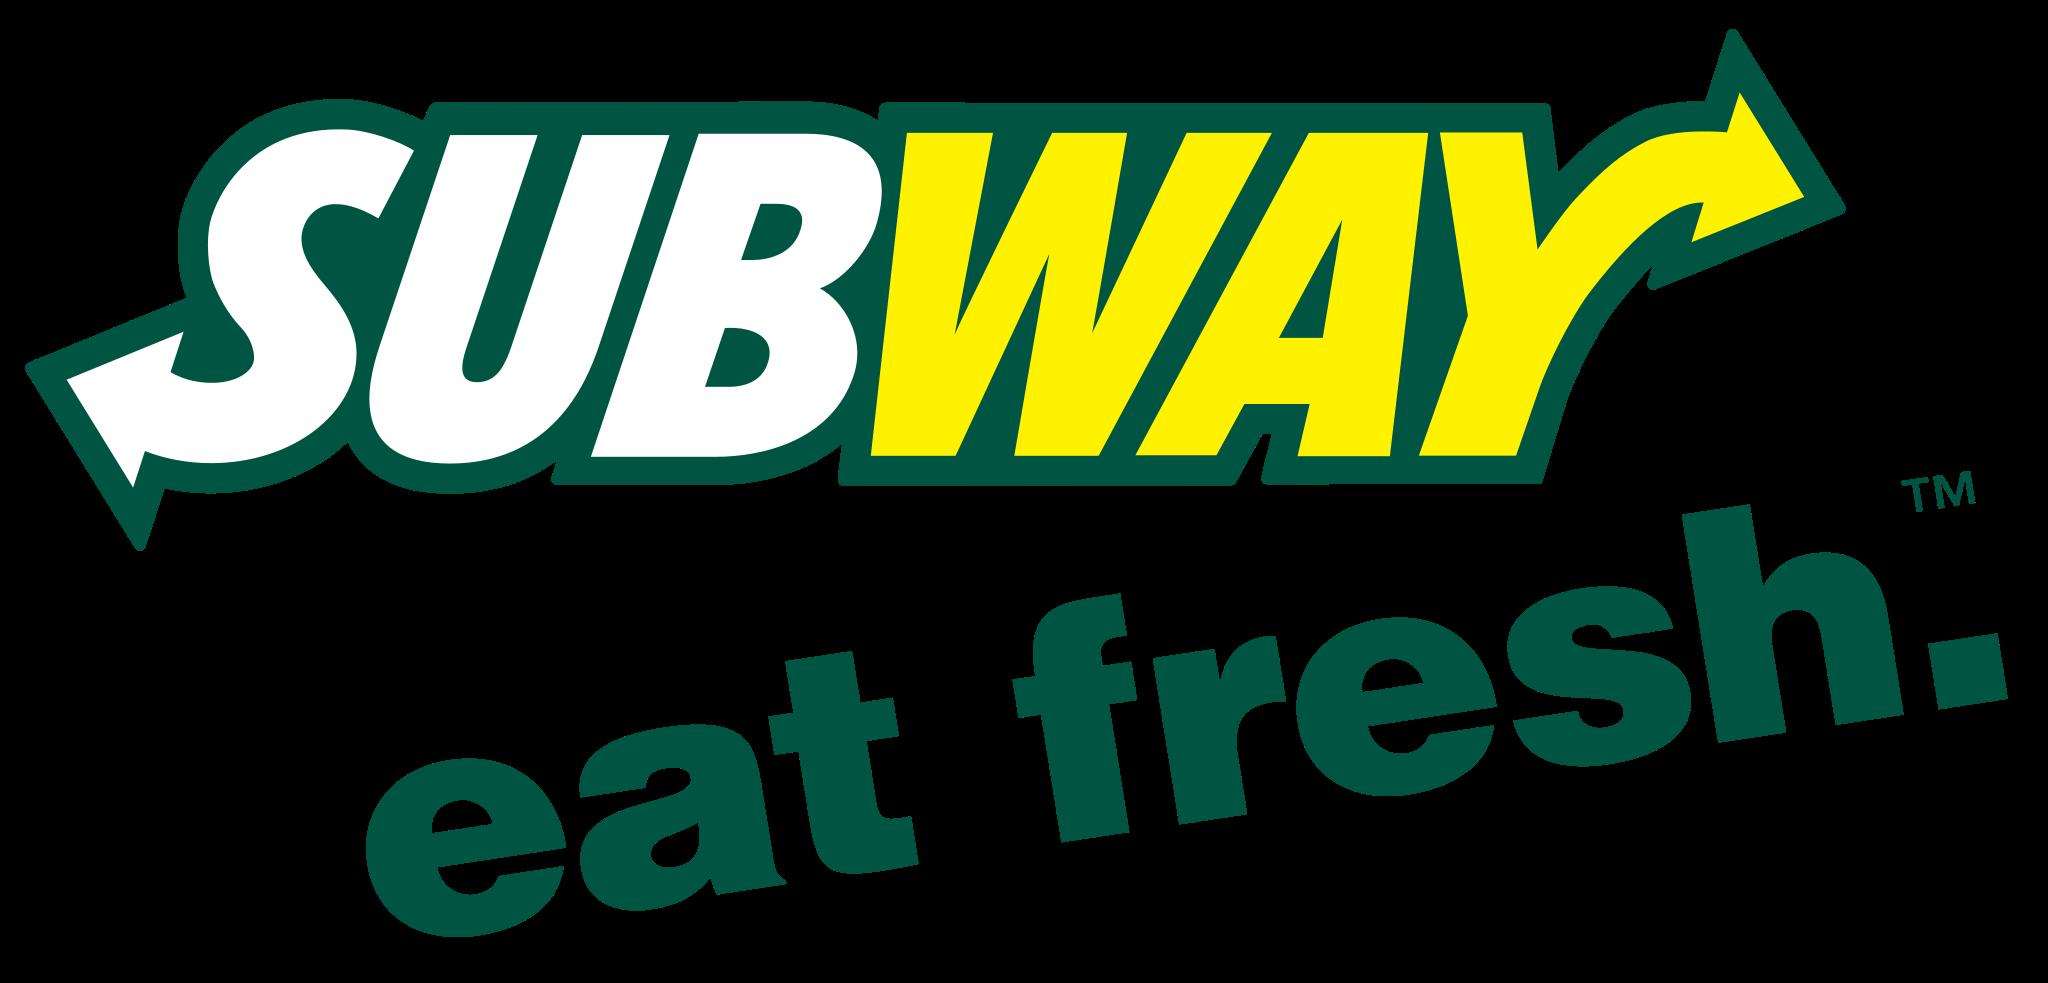 Subway_restaurant.png